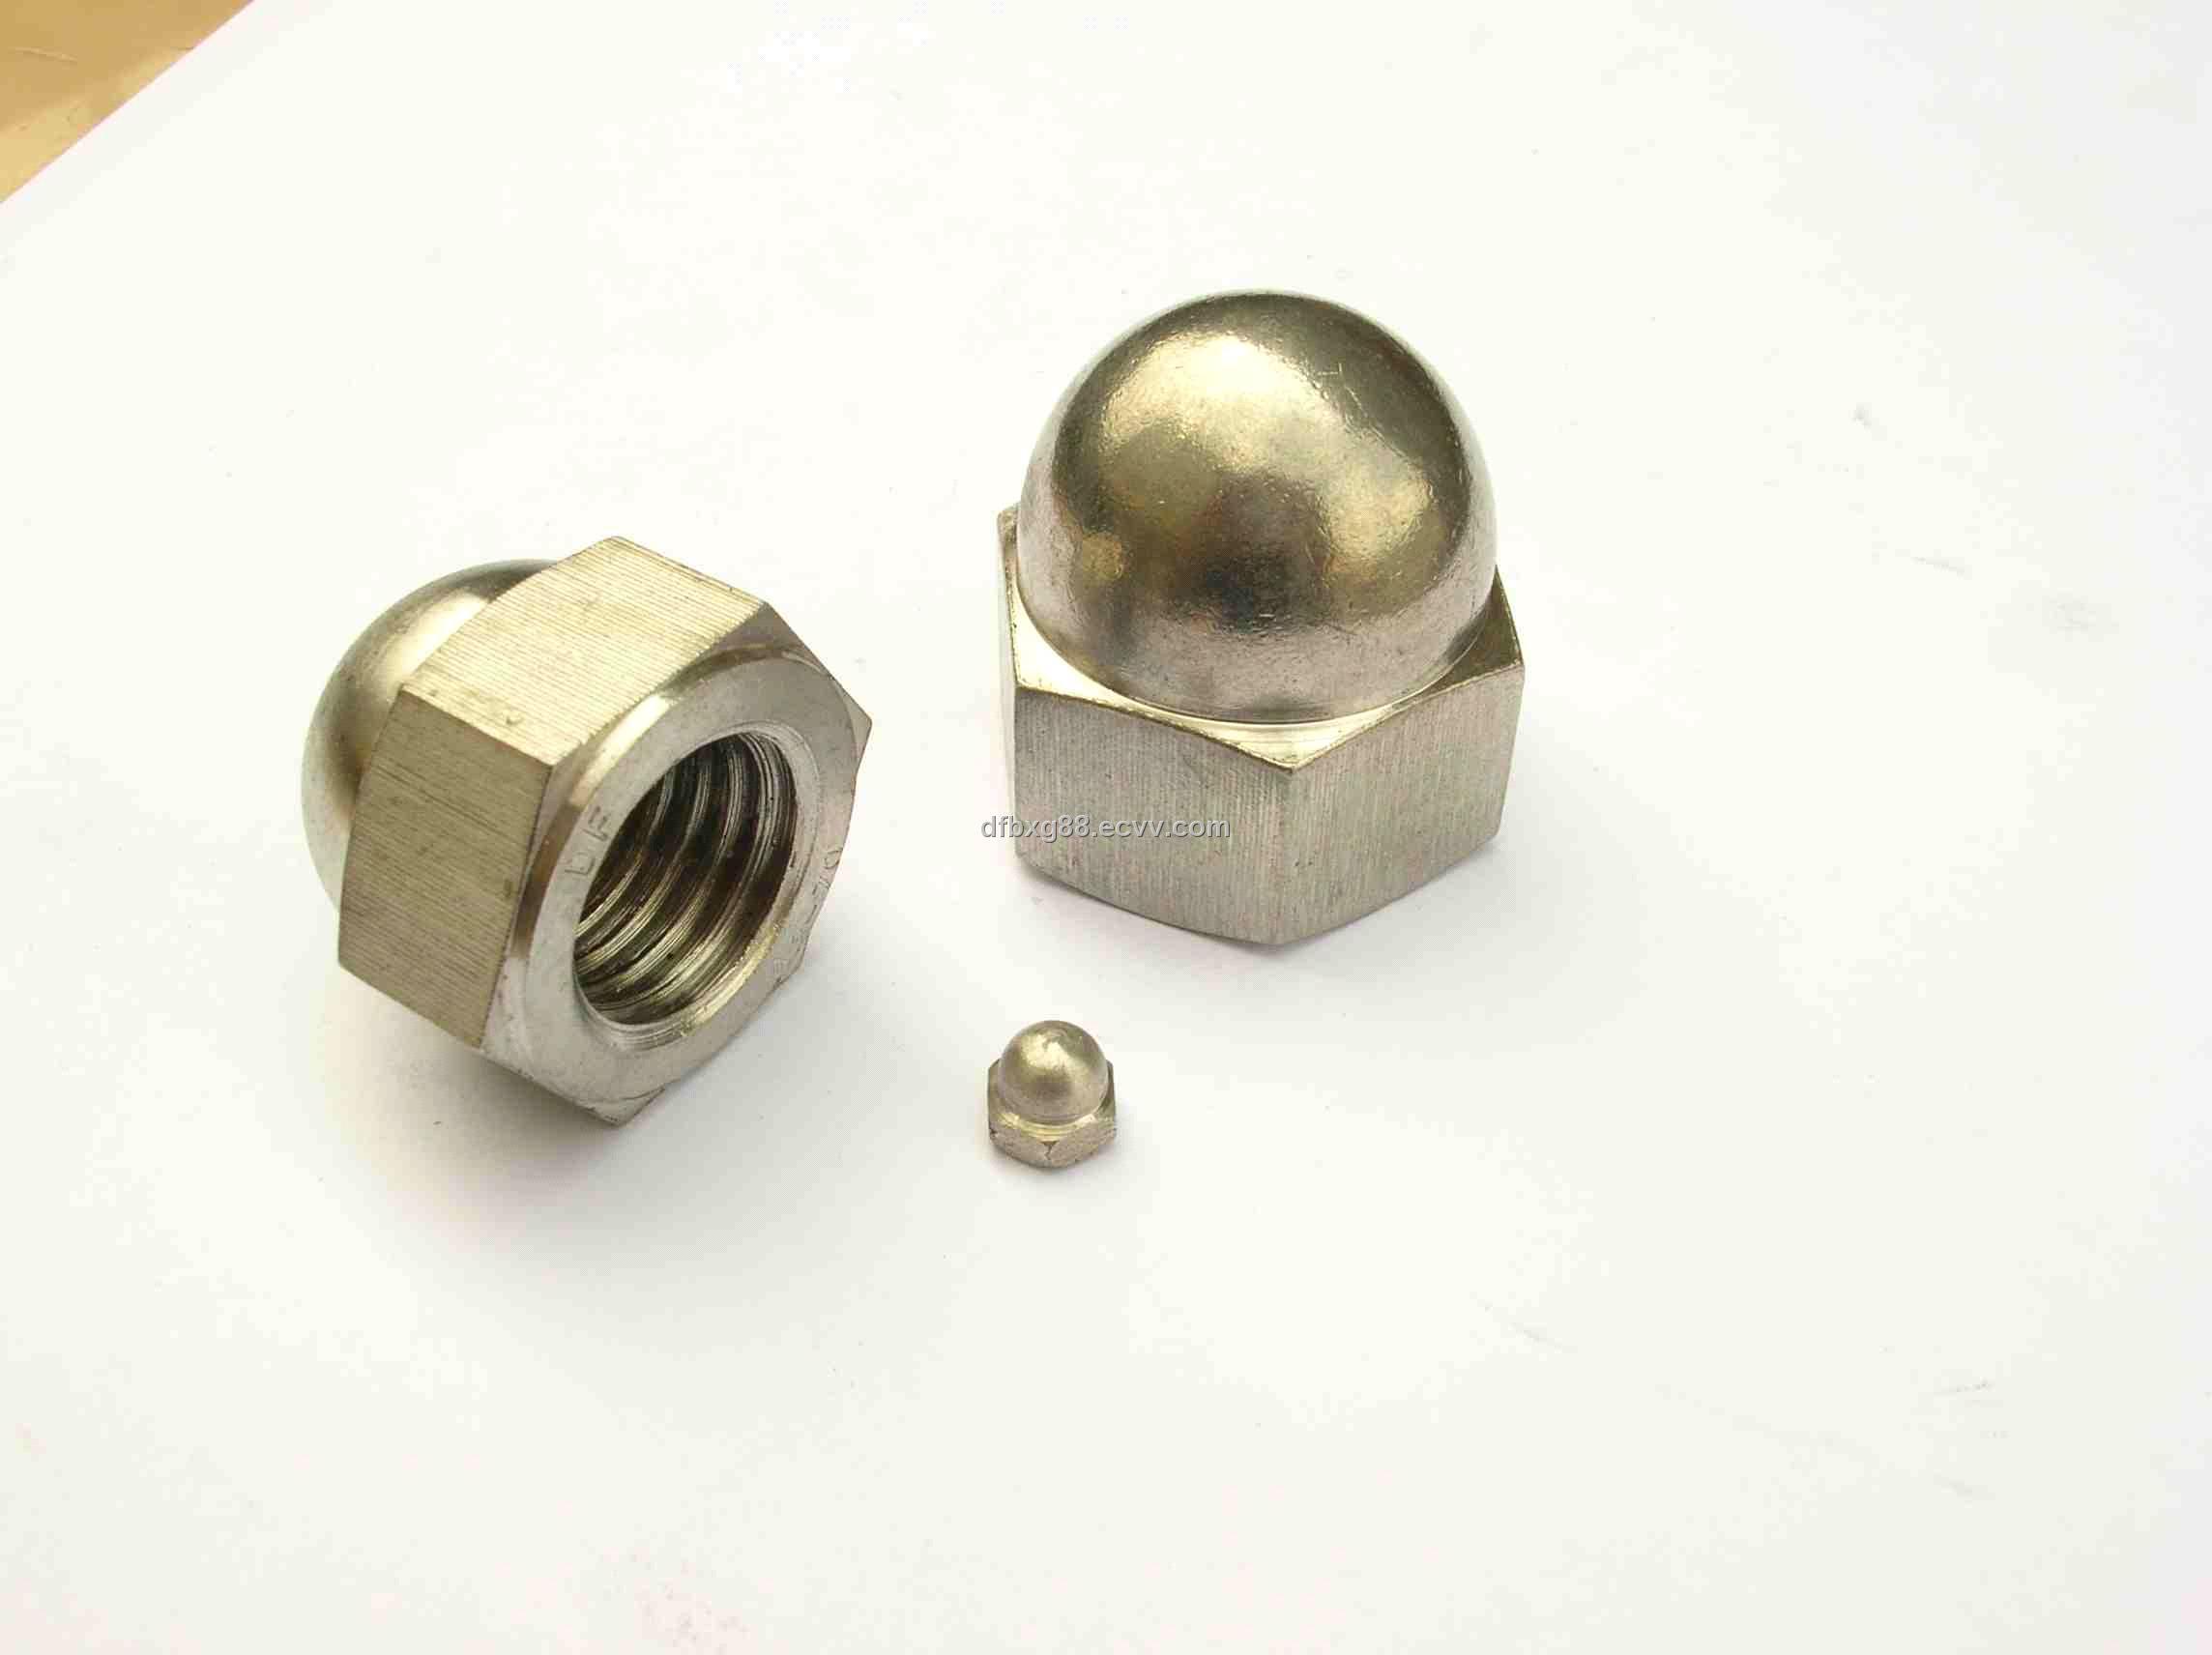 Hexagon Domed Cap Nut (DIN1587) (DIN1587) - China DIN1587, DF